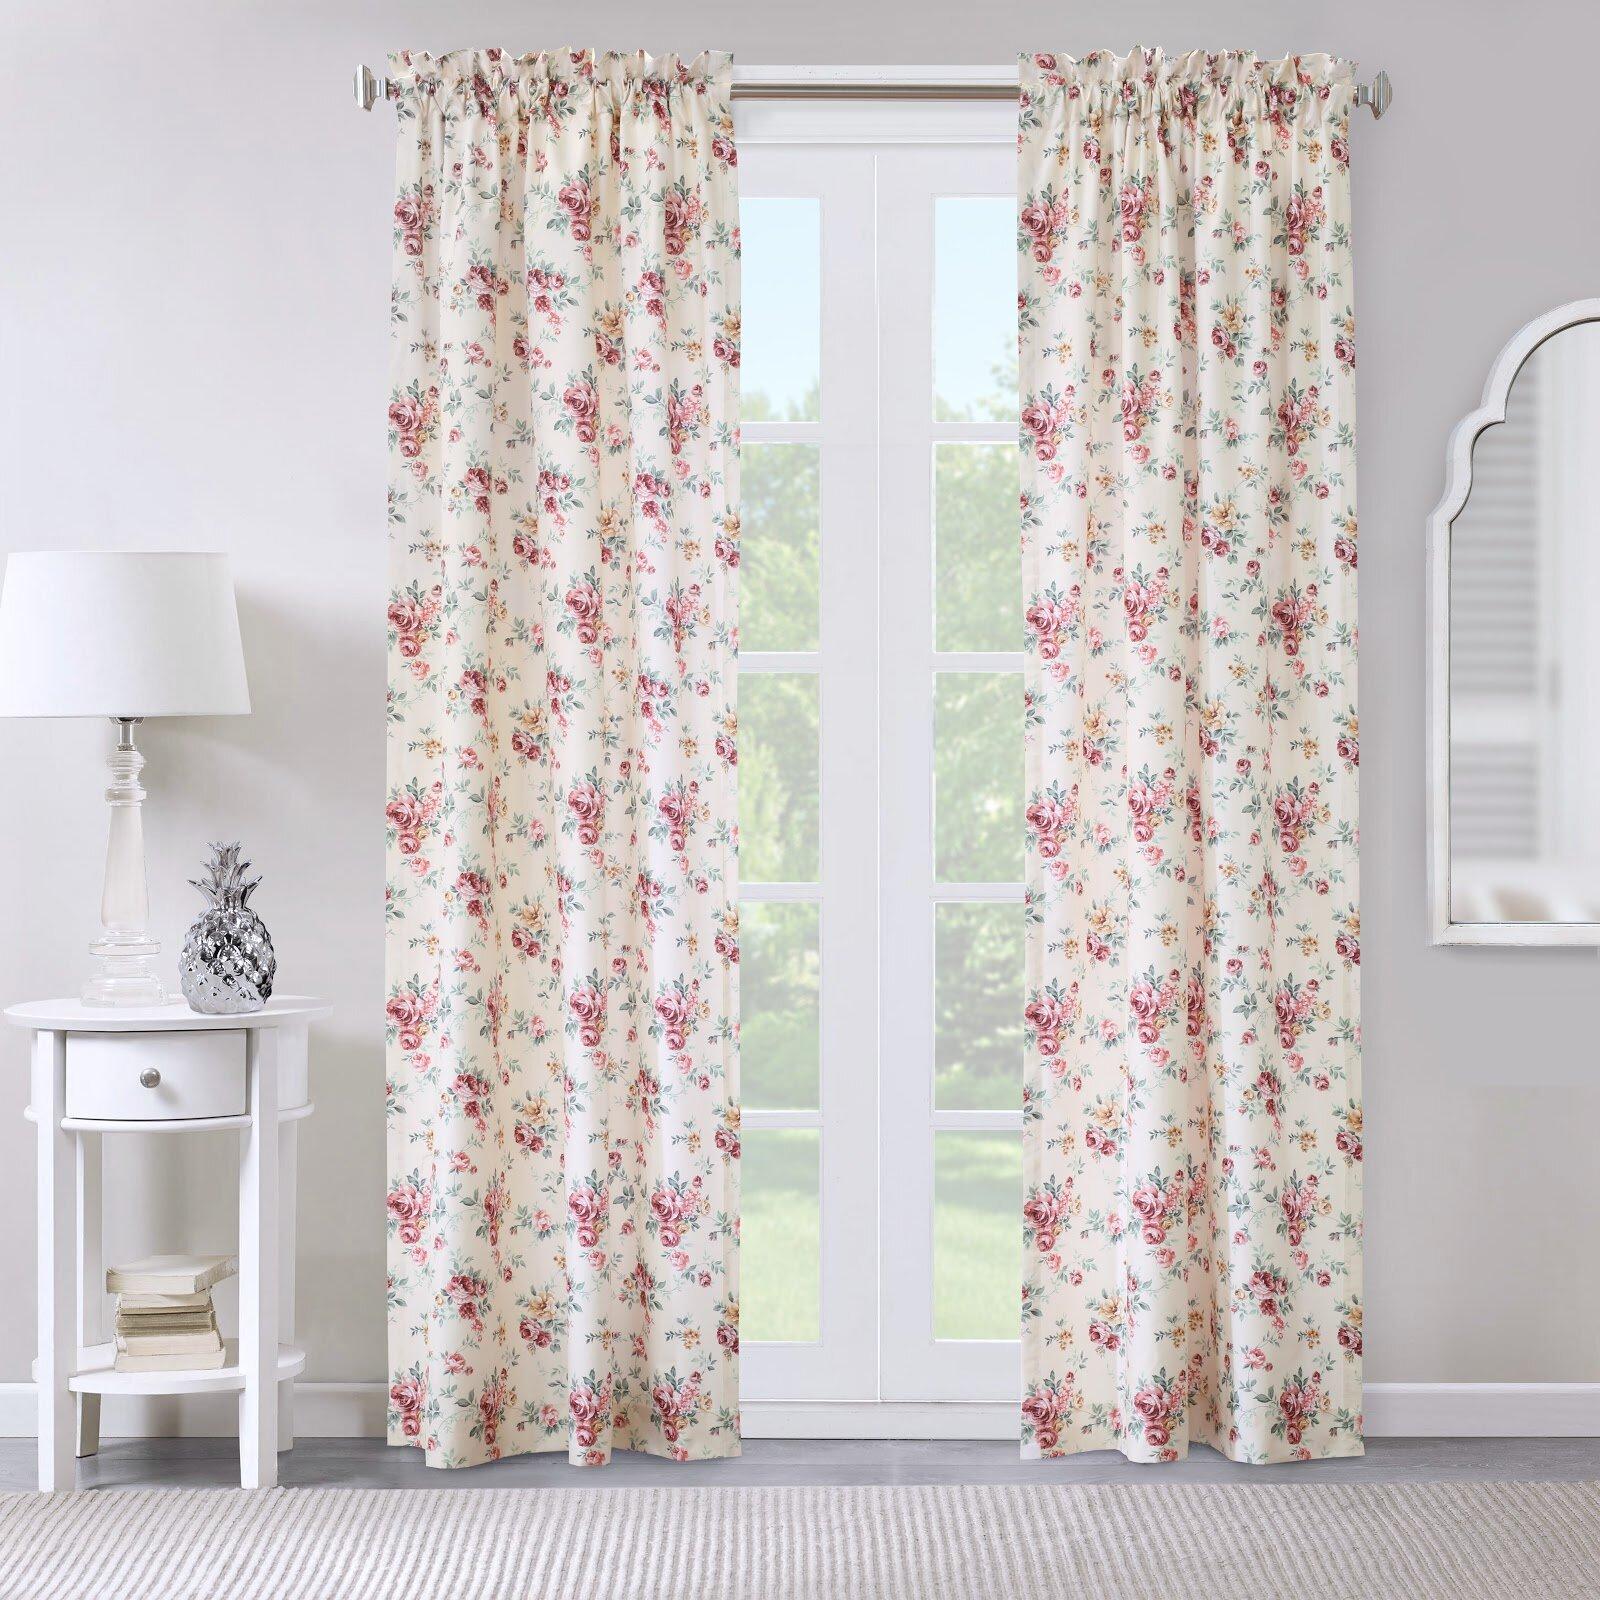 House Of Hampton Pettway Floral Room Darkening Thermal Rod Pocket Curtain Panels Reviews Wayfair